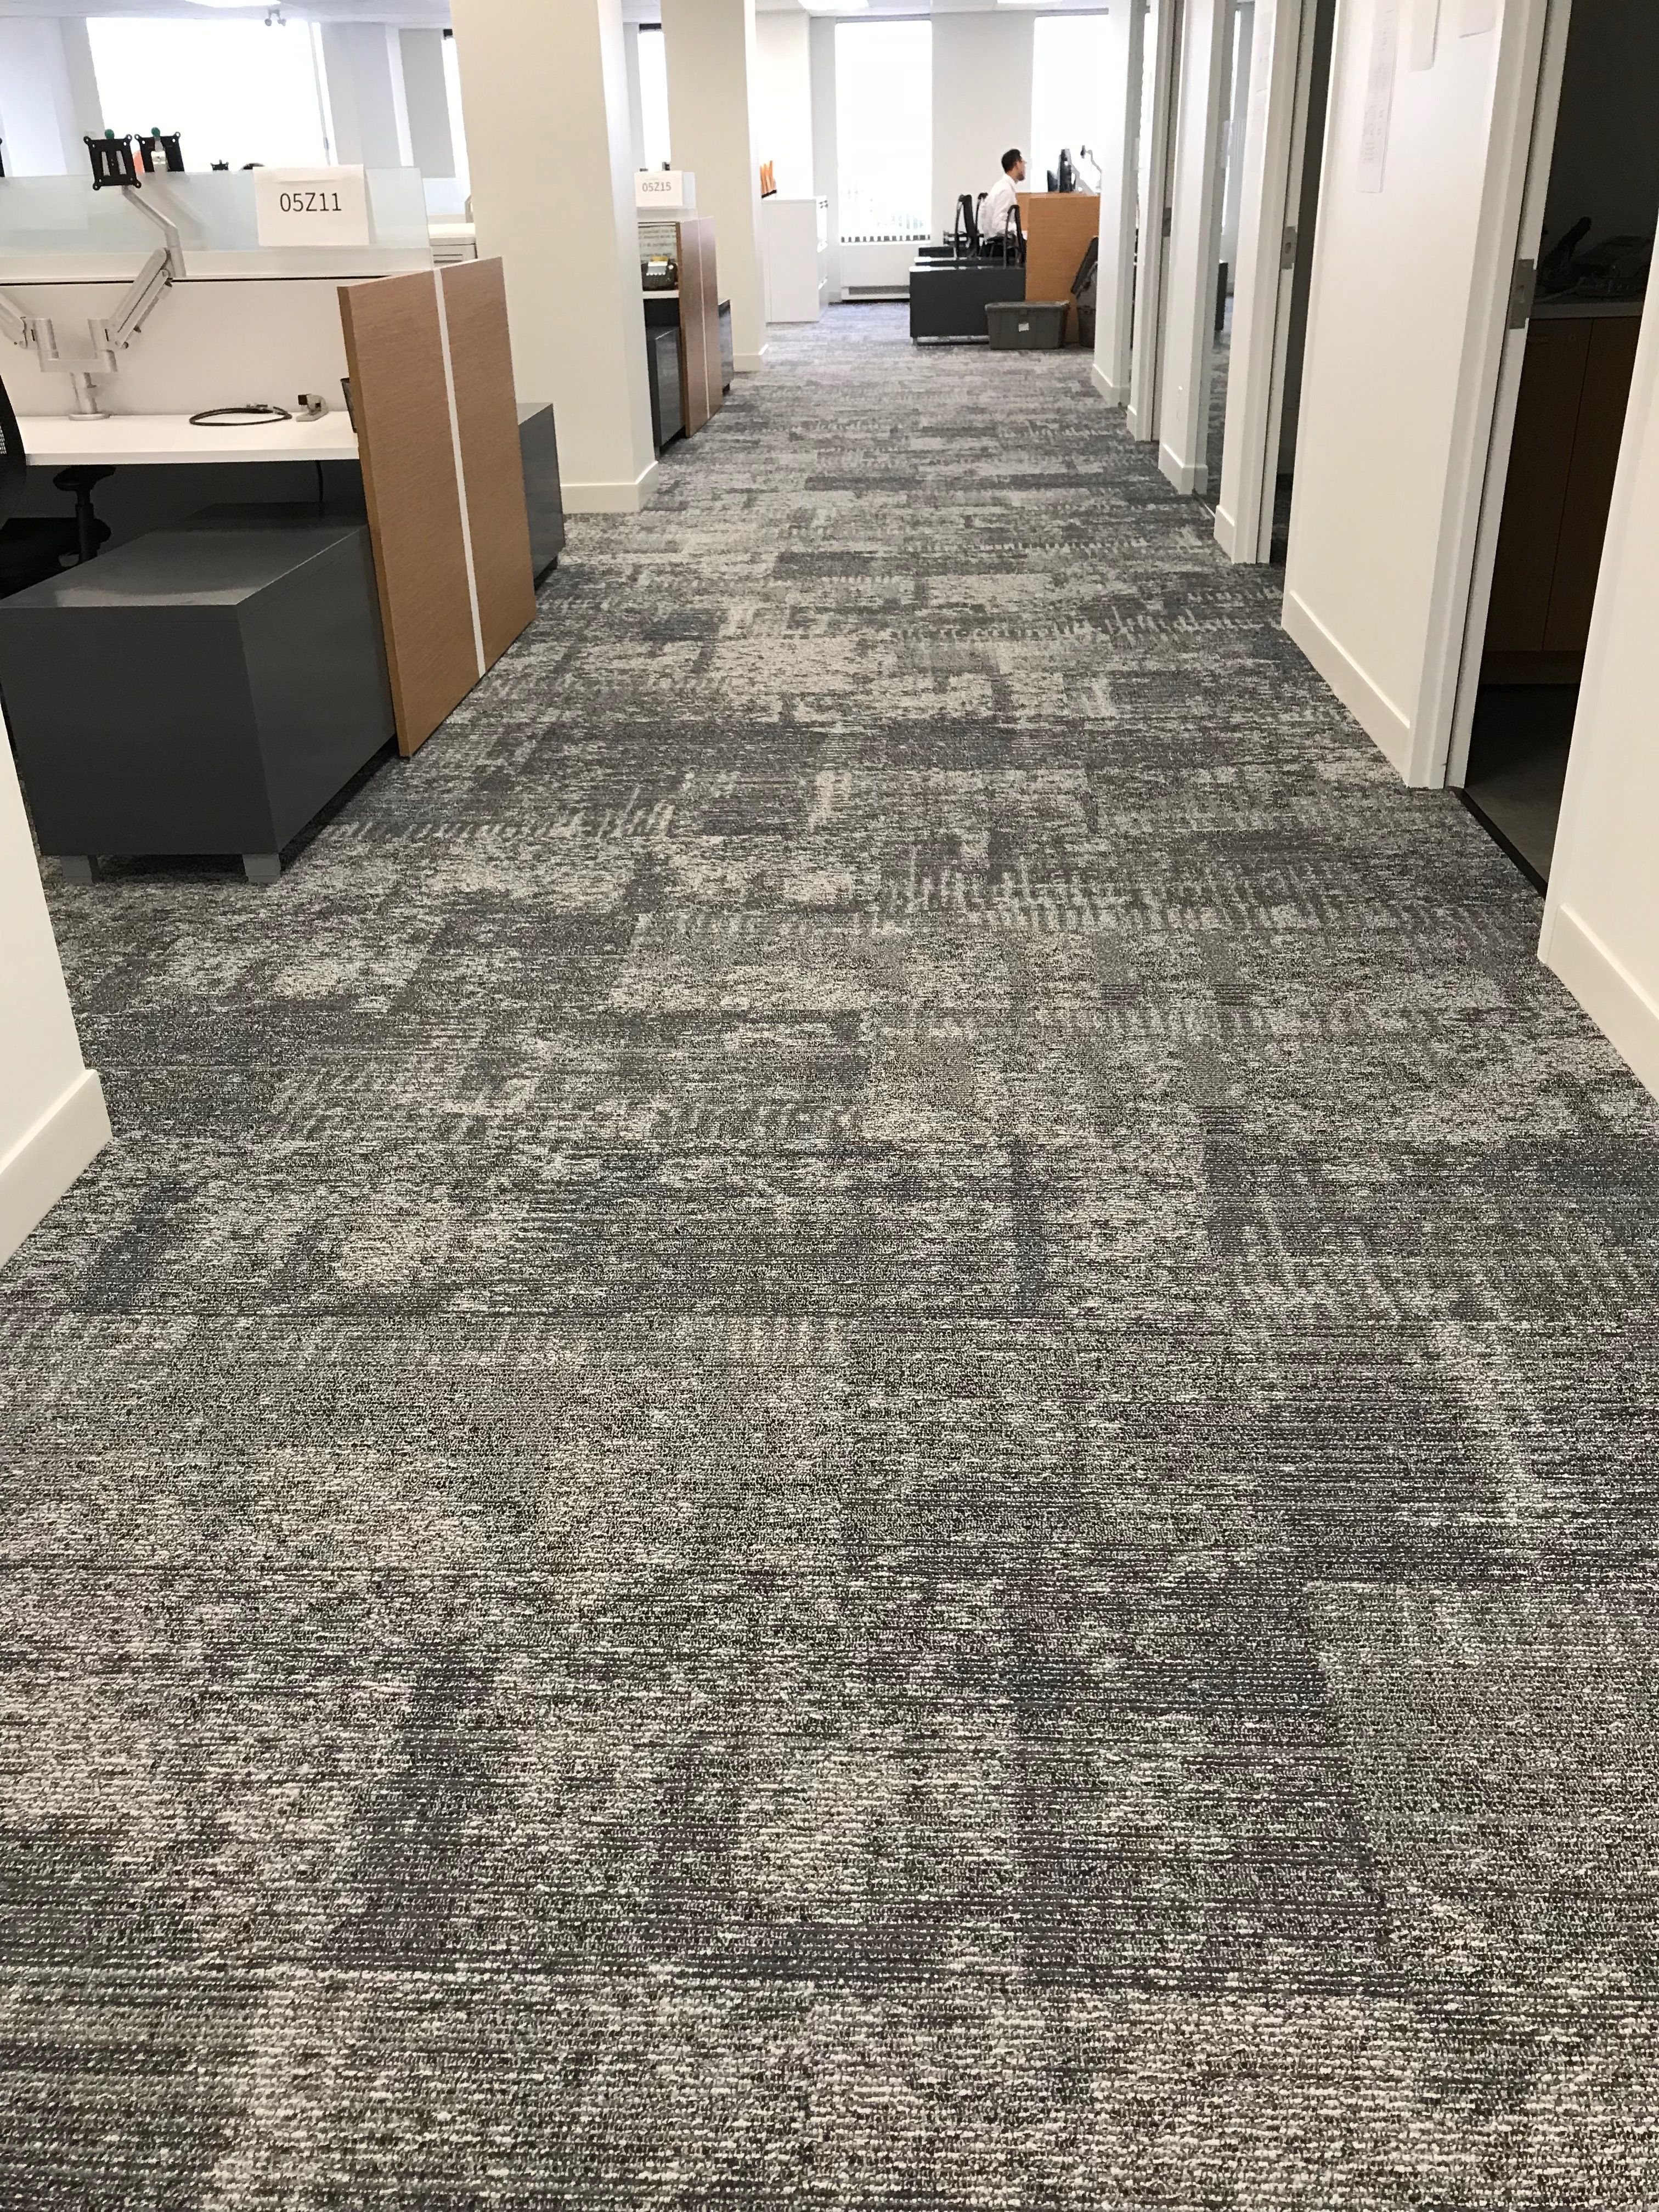 Pin By Sinoflor Carpet Tiles On Great Floors Decor Flooring Home Decor